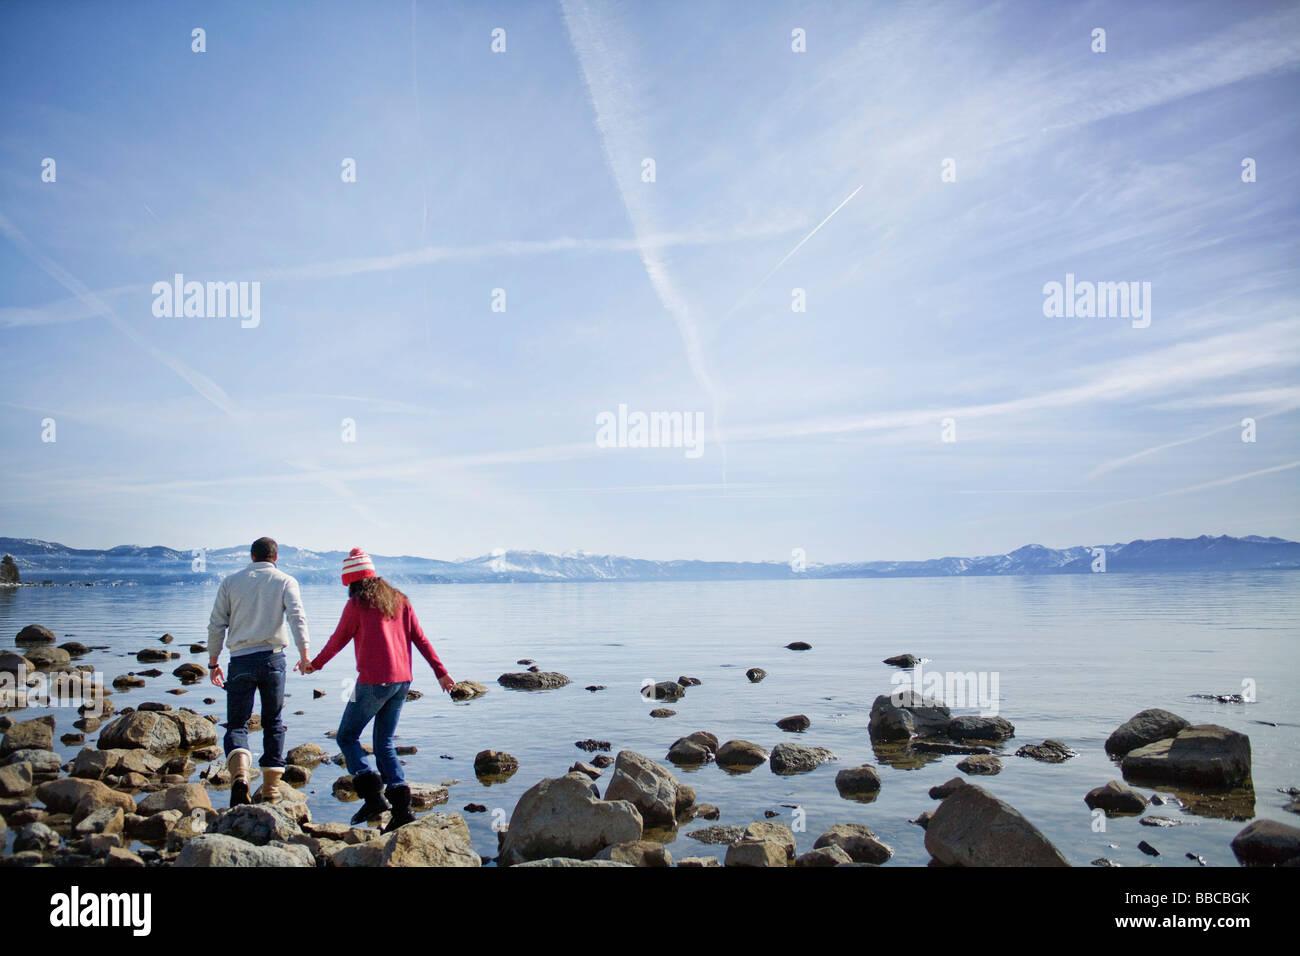 Couple walking on rocks near lake - Stock Image